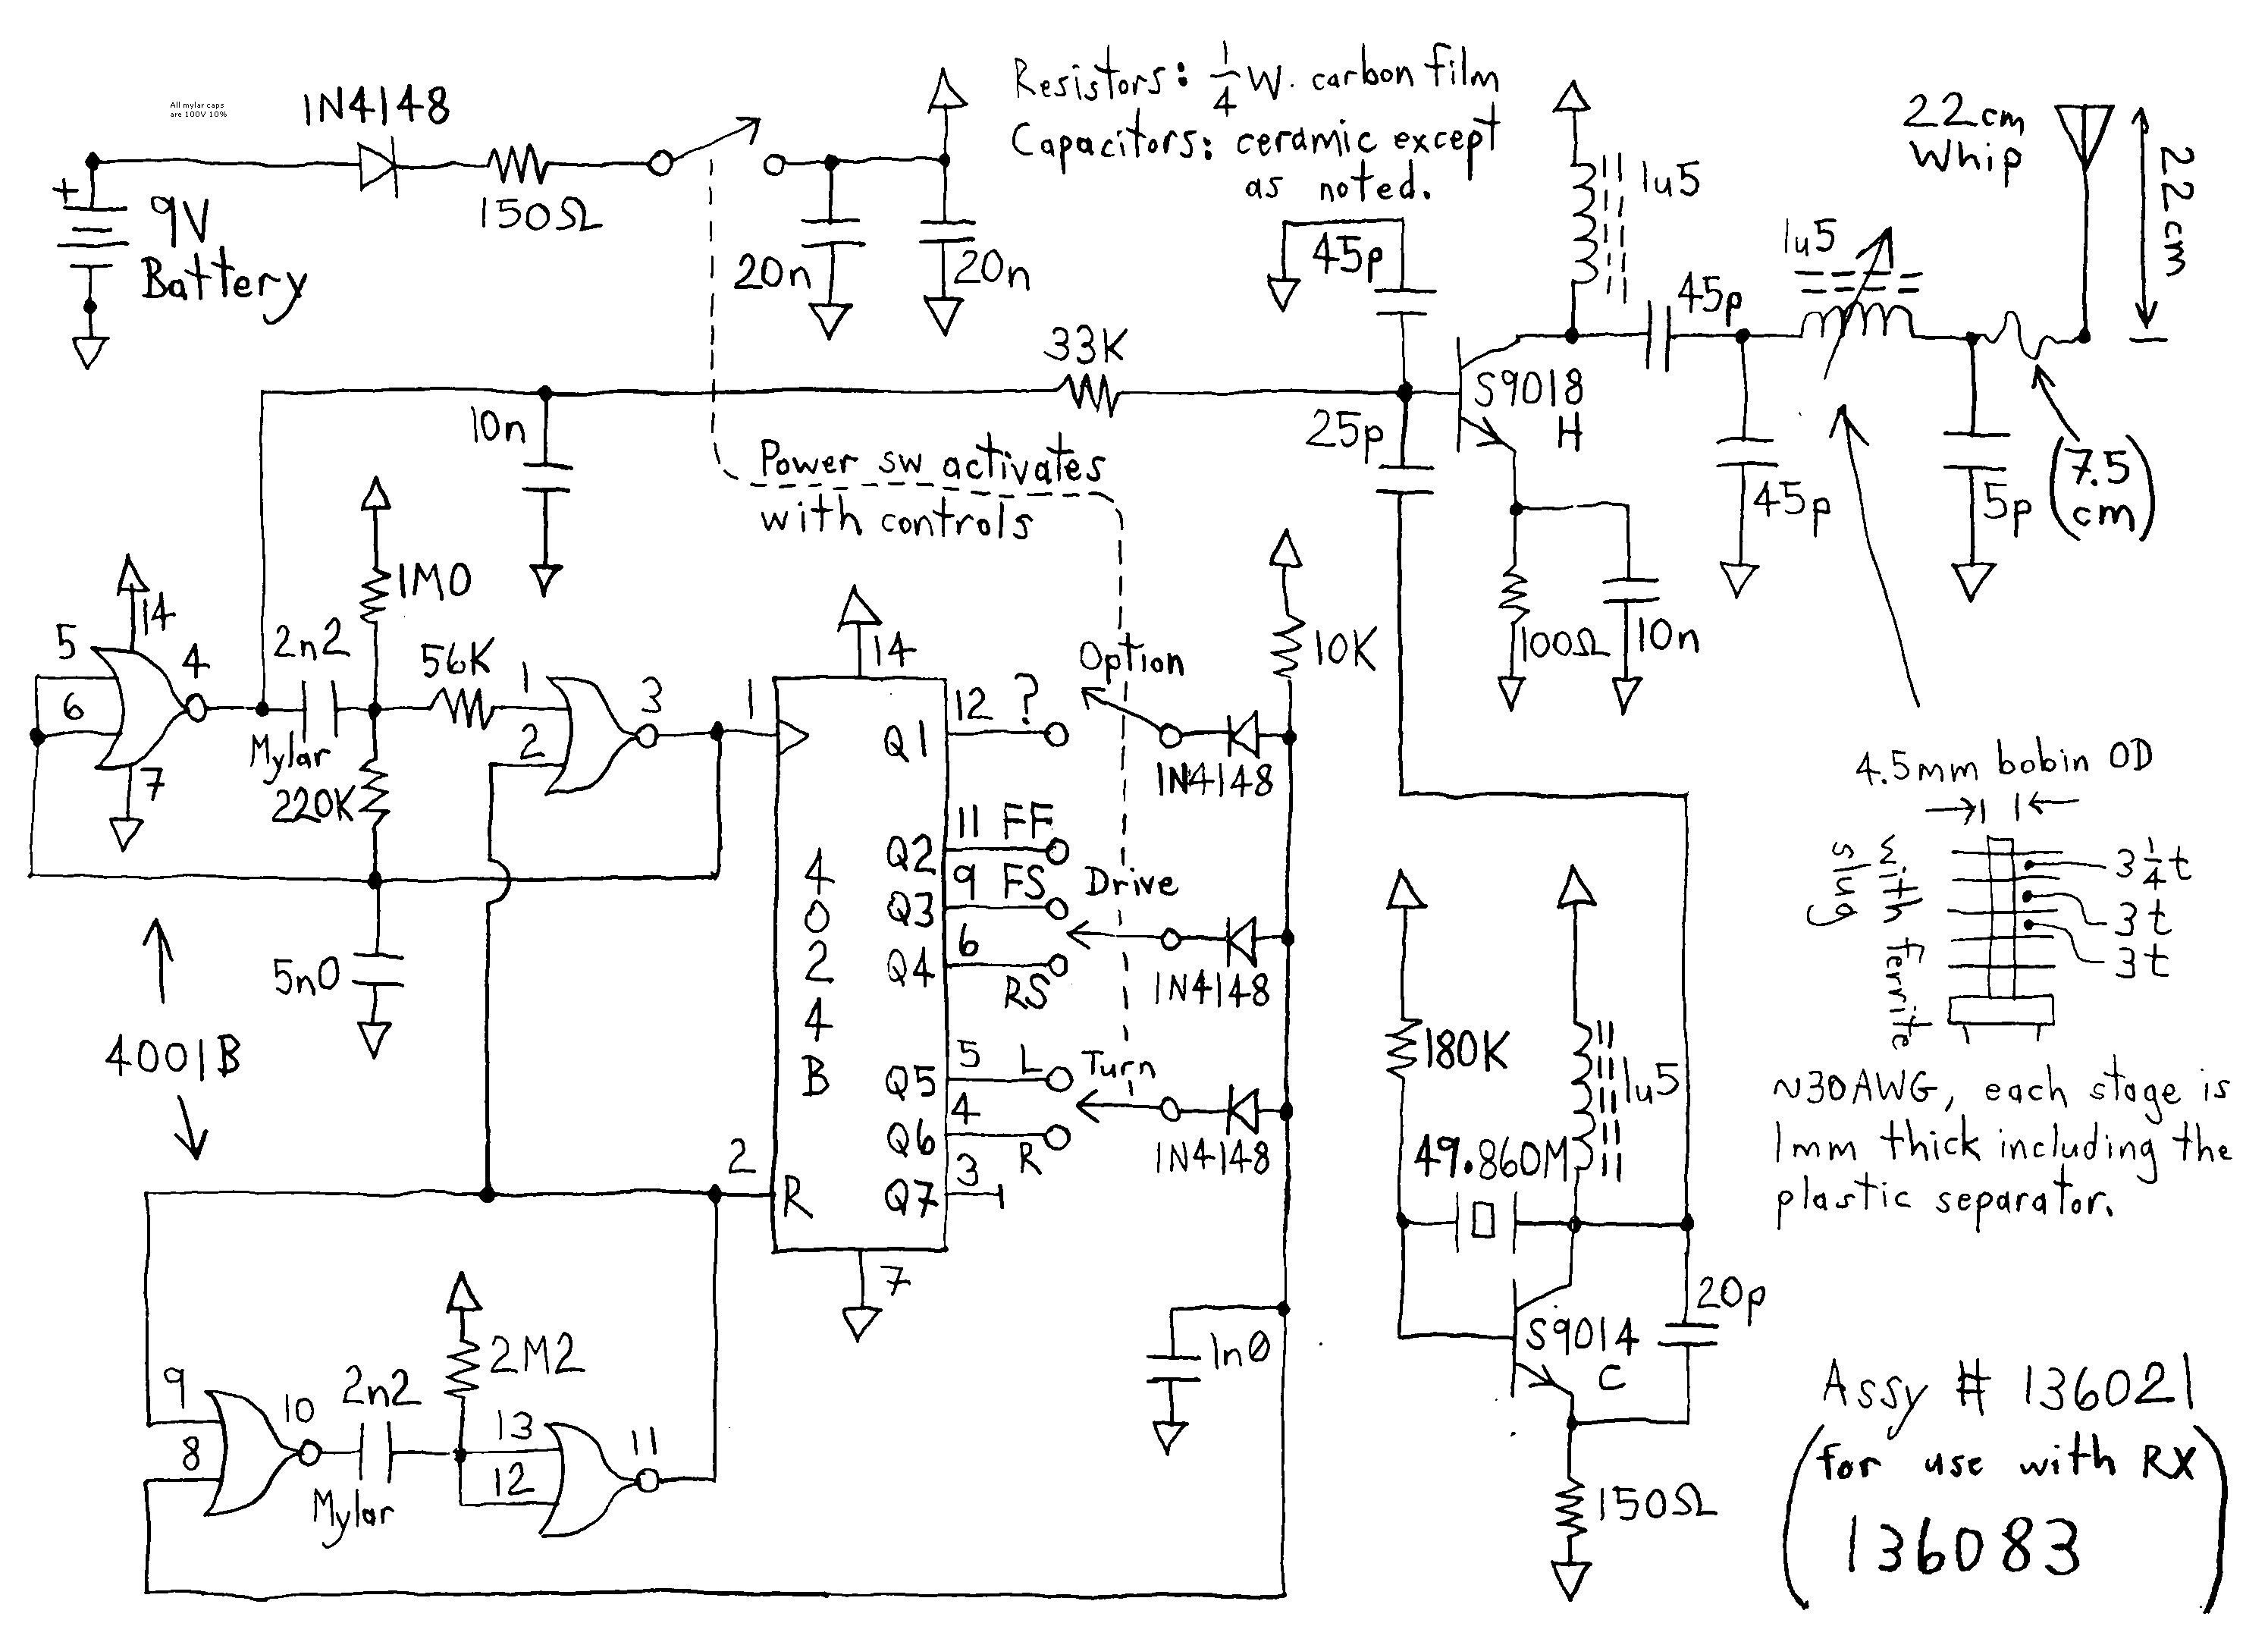 19 Complex Wiring Diagram Symbols Automotive Design